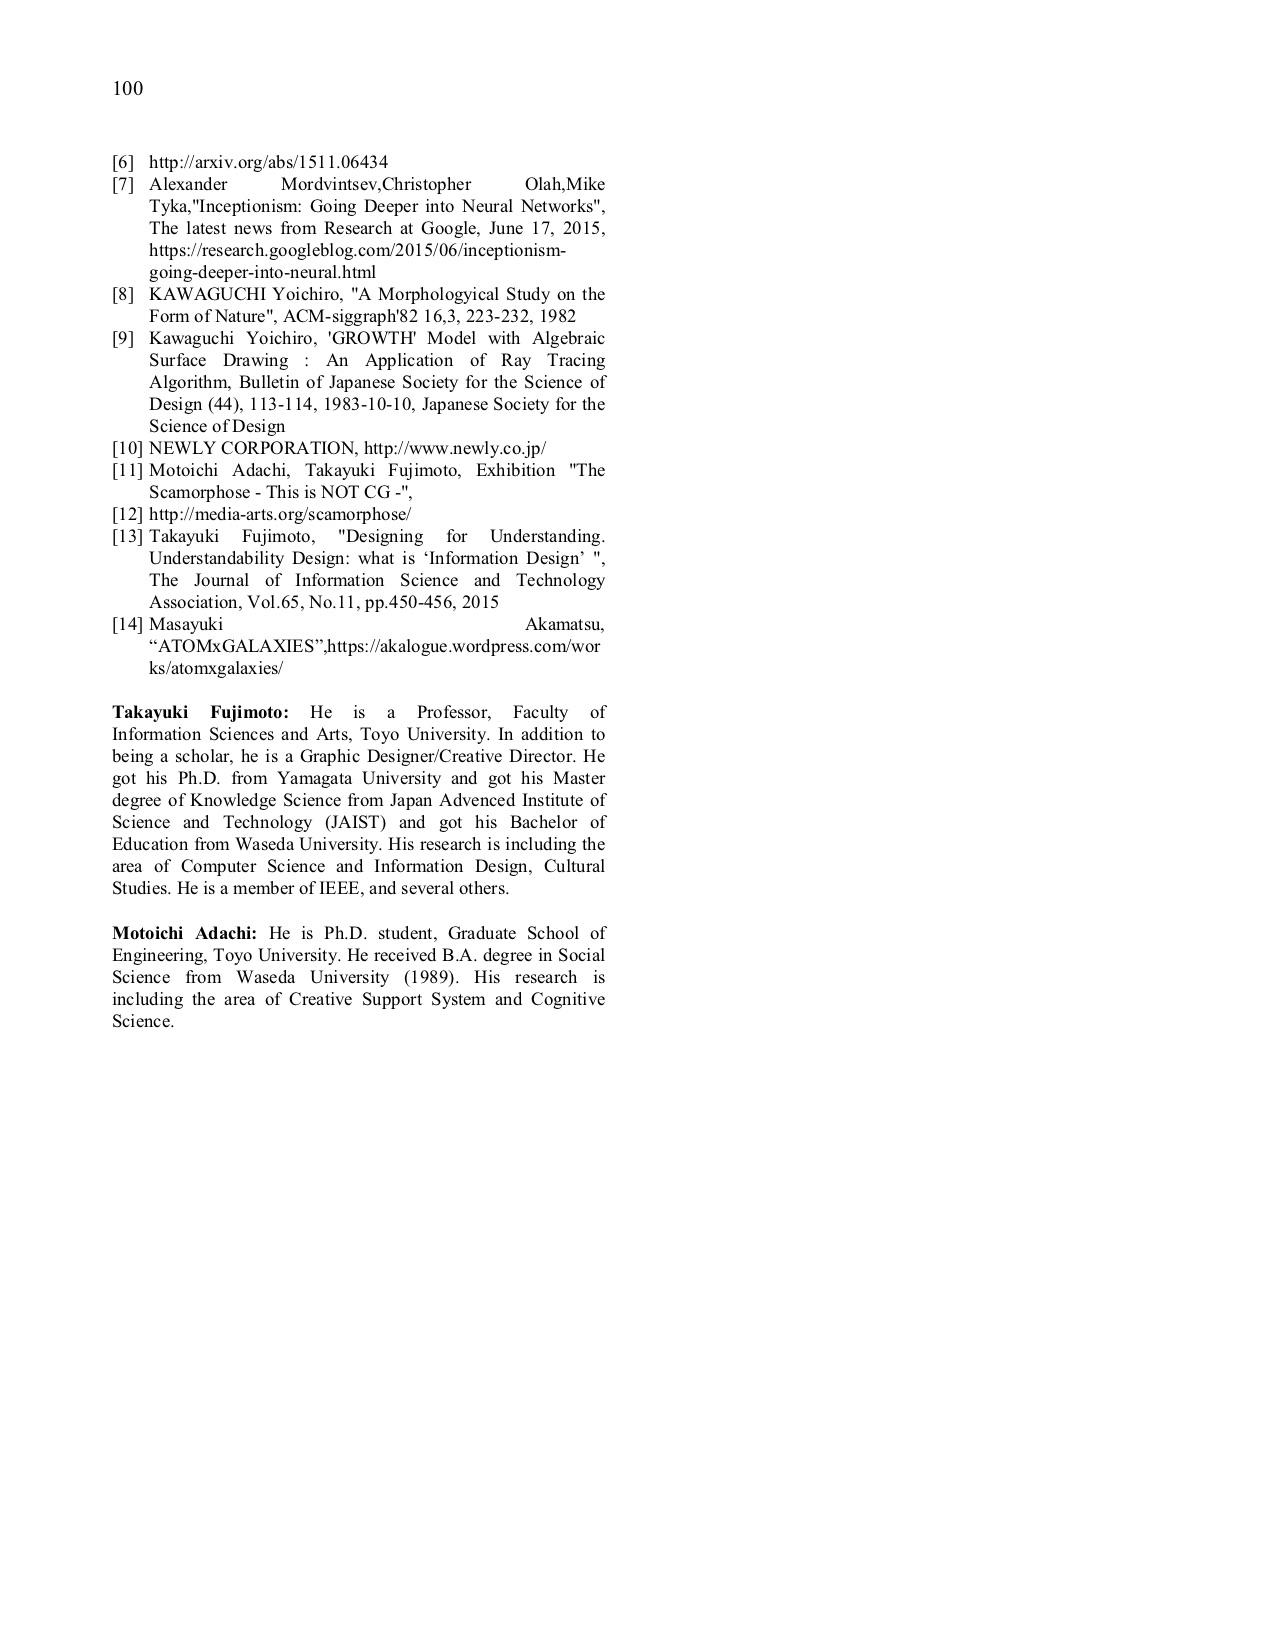 Academic Paper p7